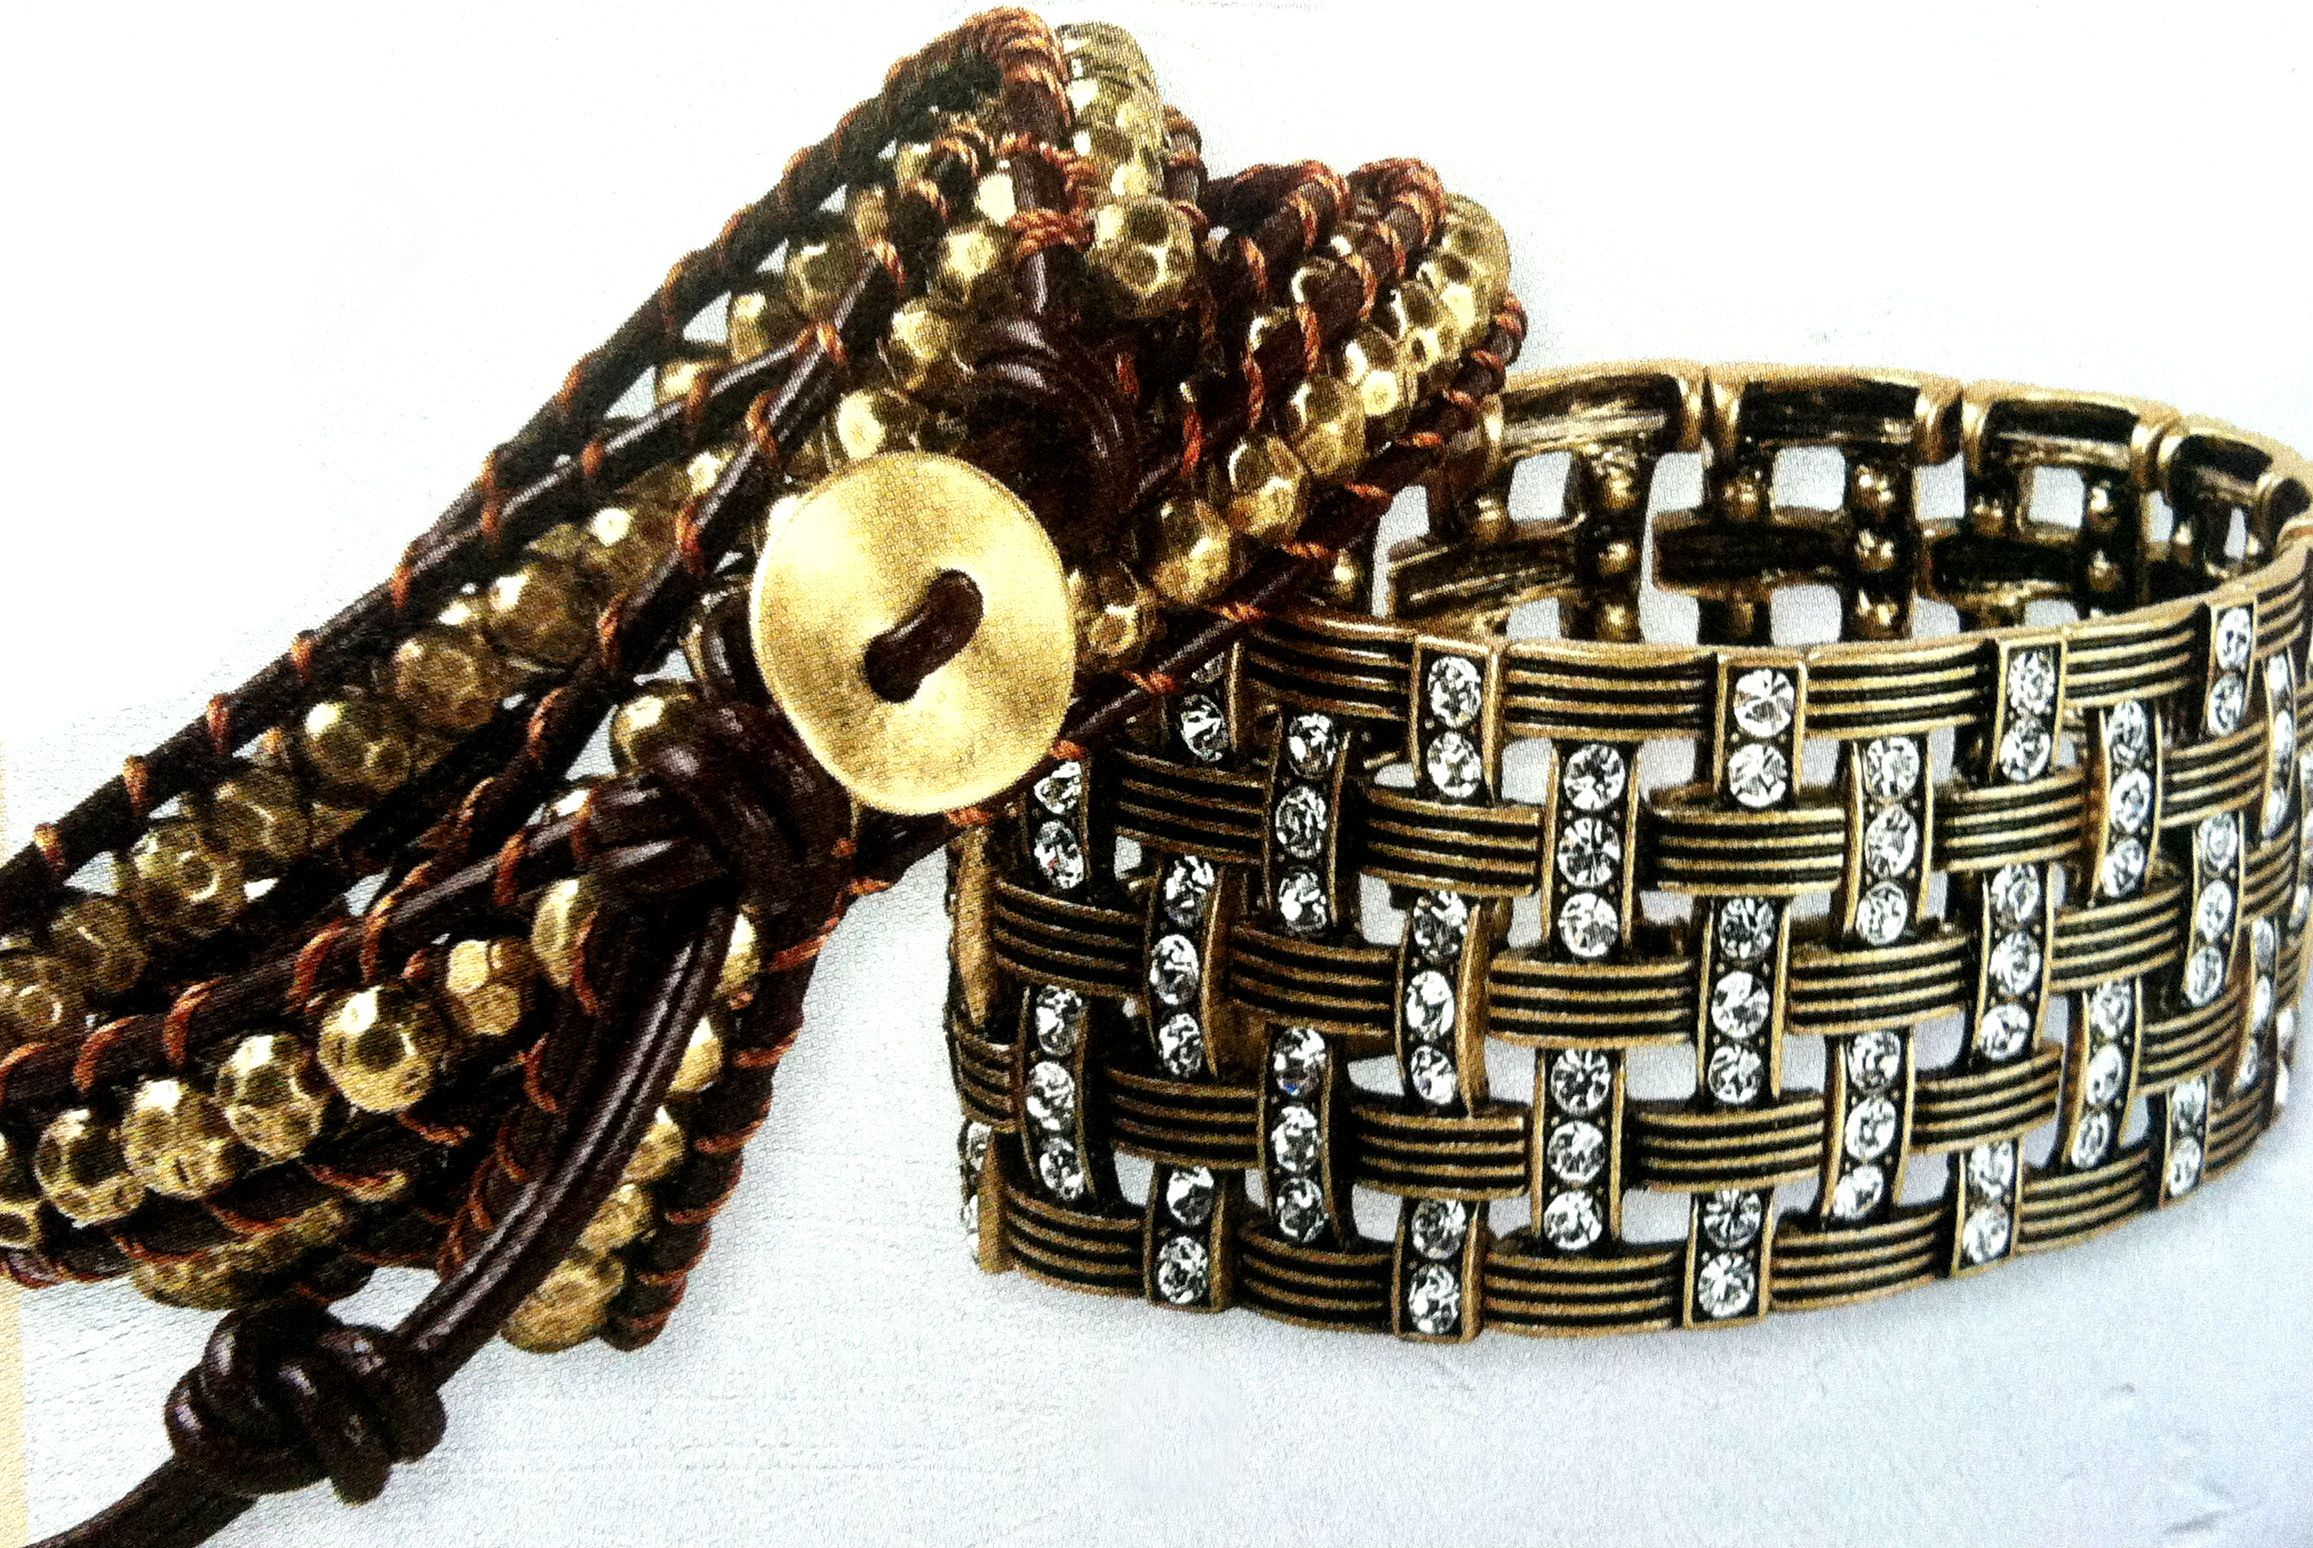 Premier Designs Its A Wrap 28 In 30 Bracelet